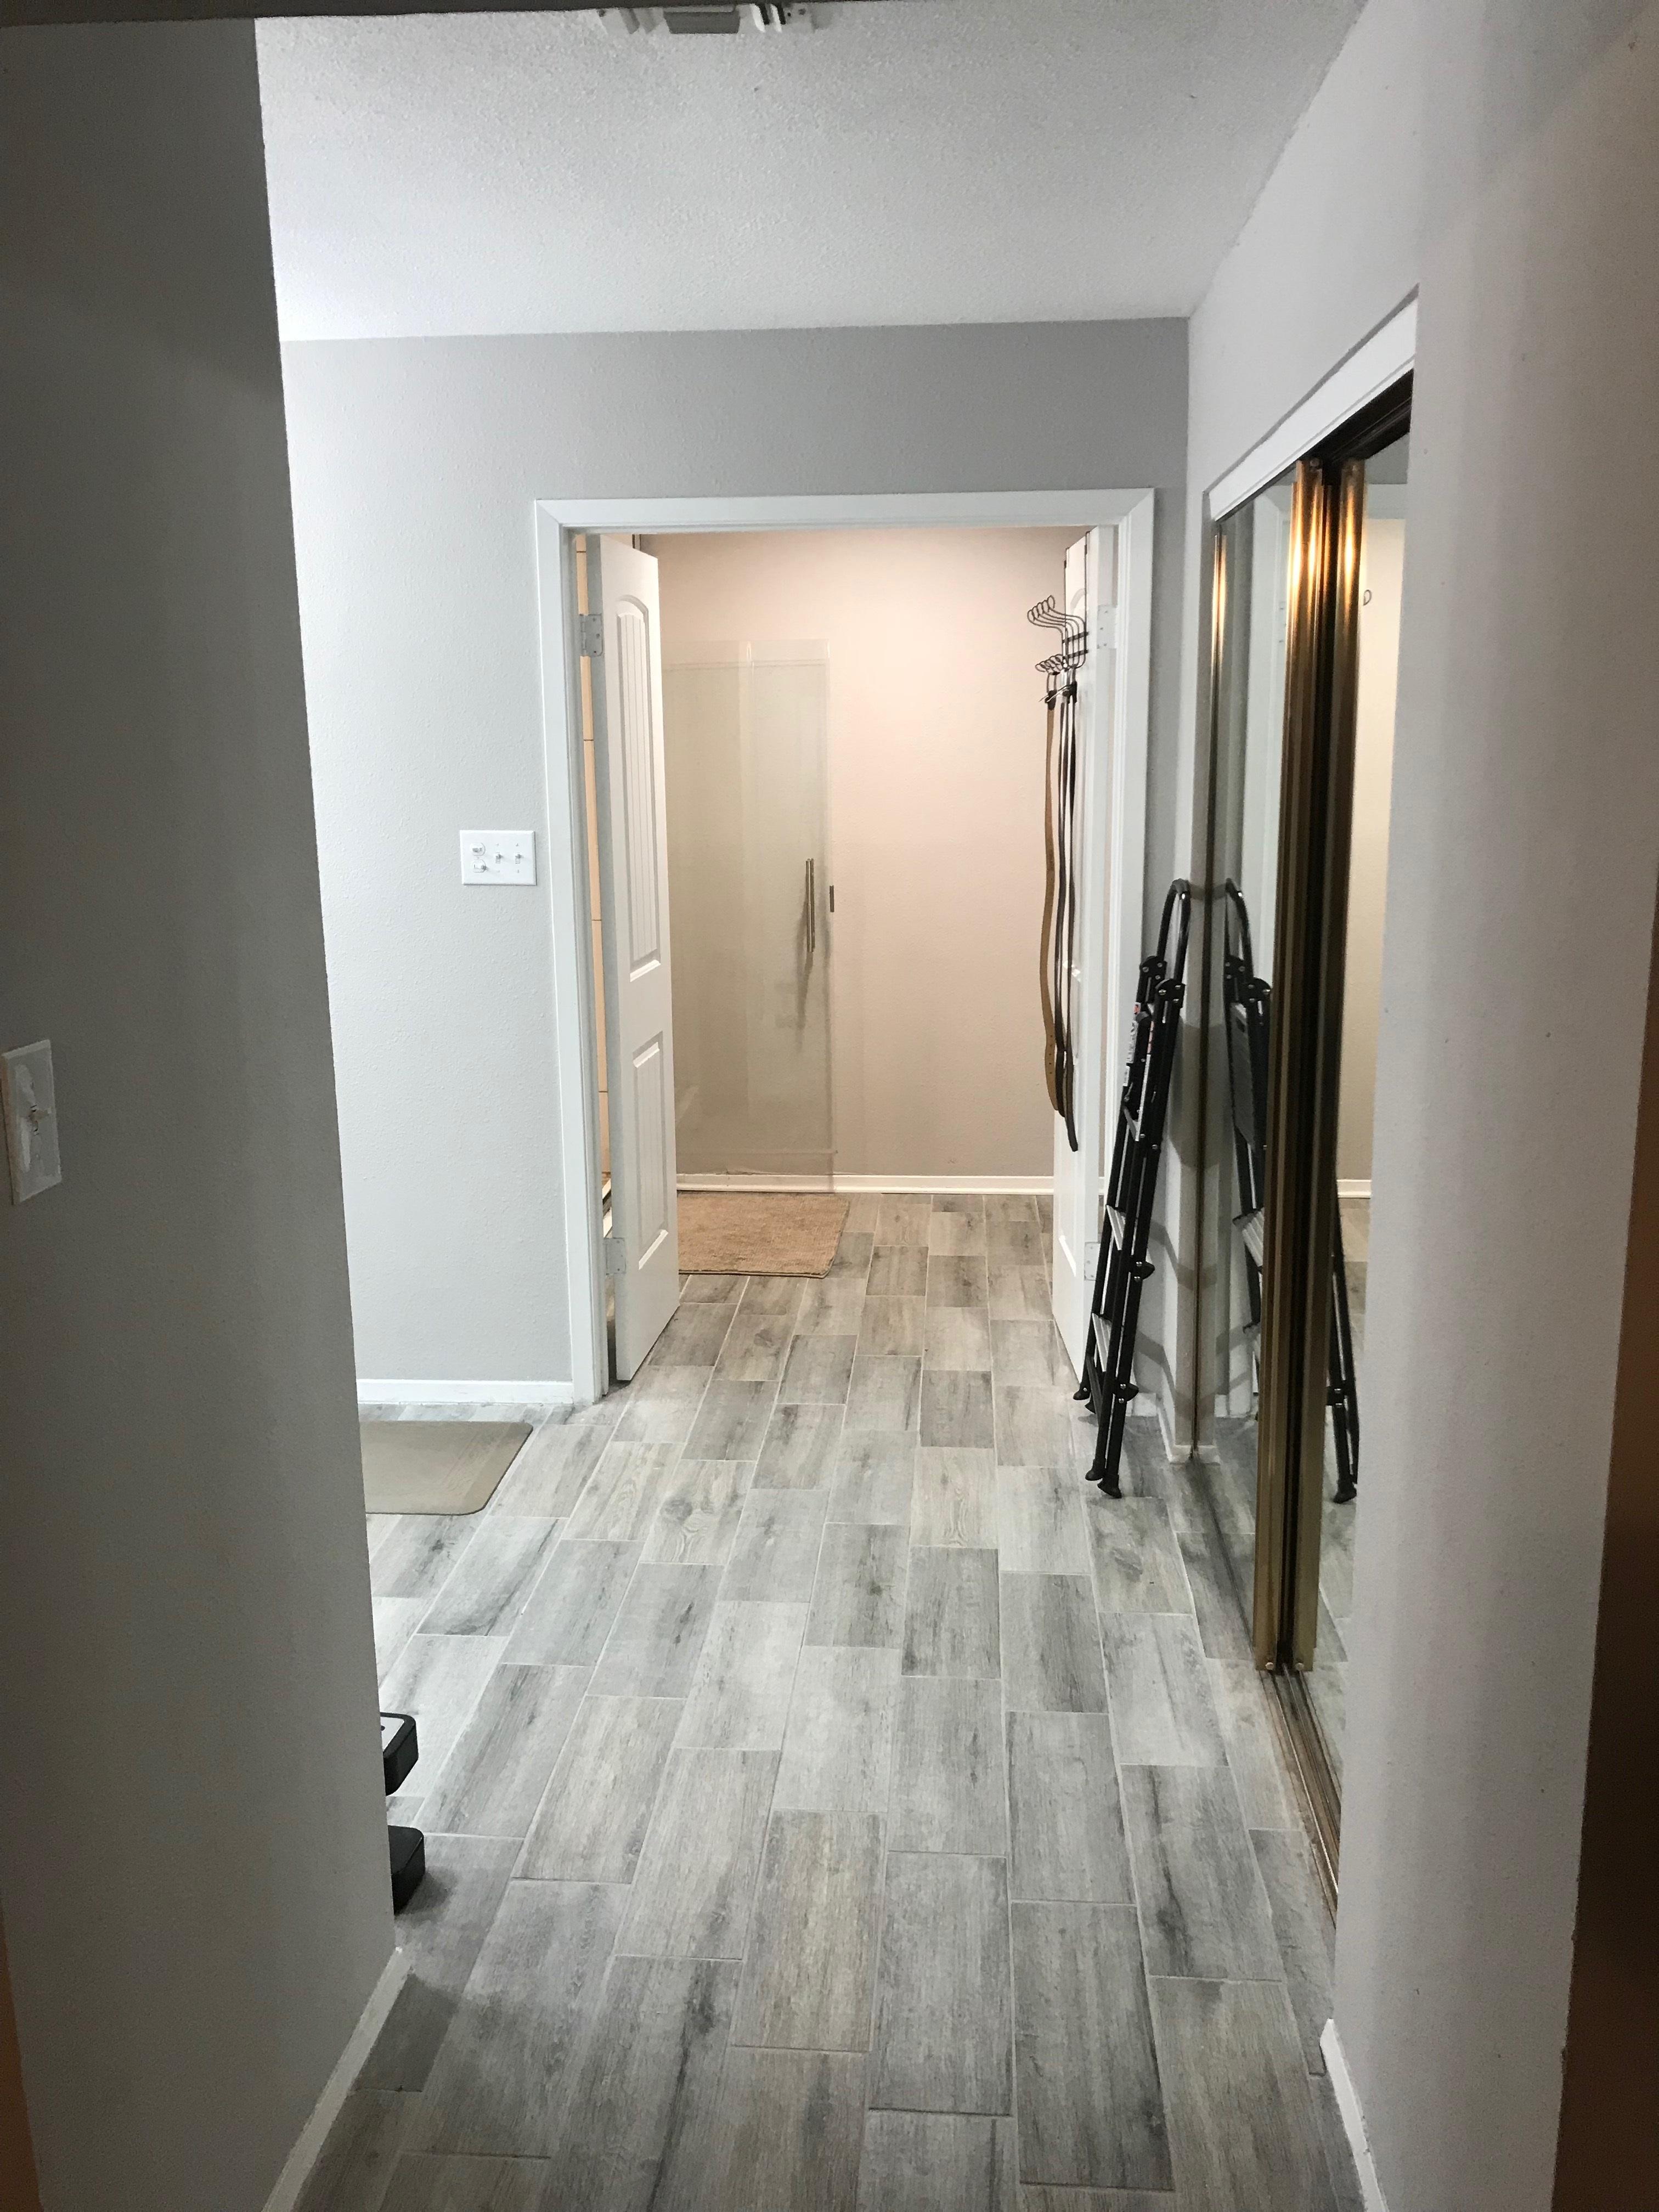 Photo of 5119 Timber Trace St, San Antonio, TX, 78250